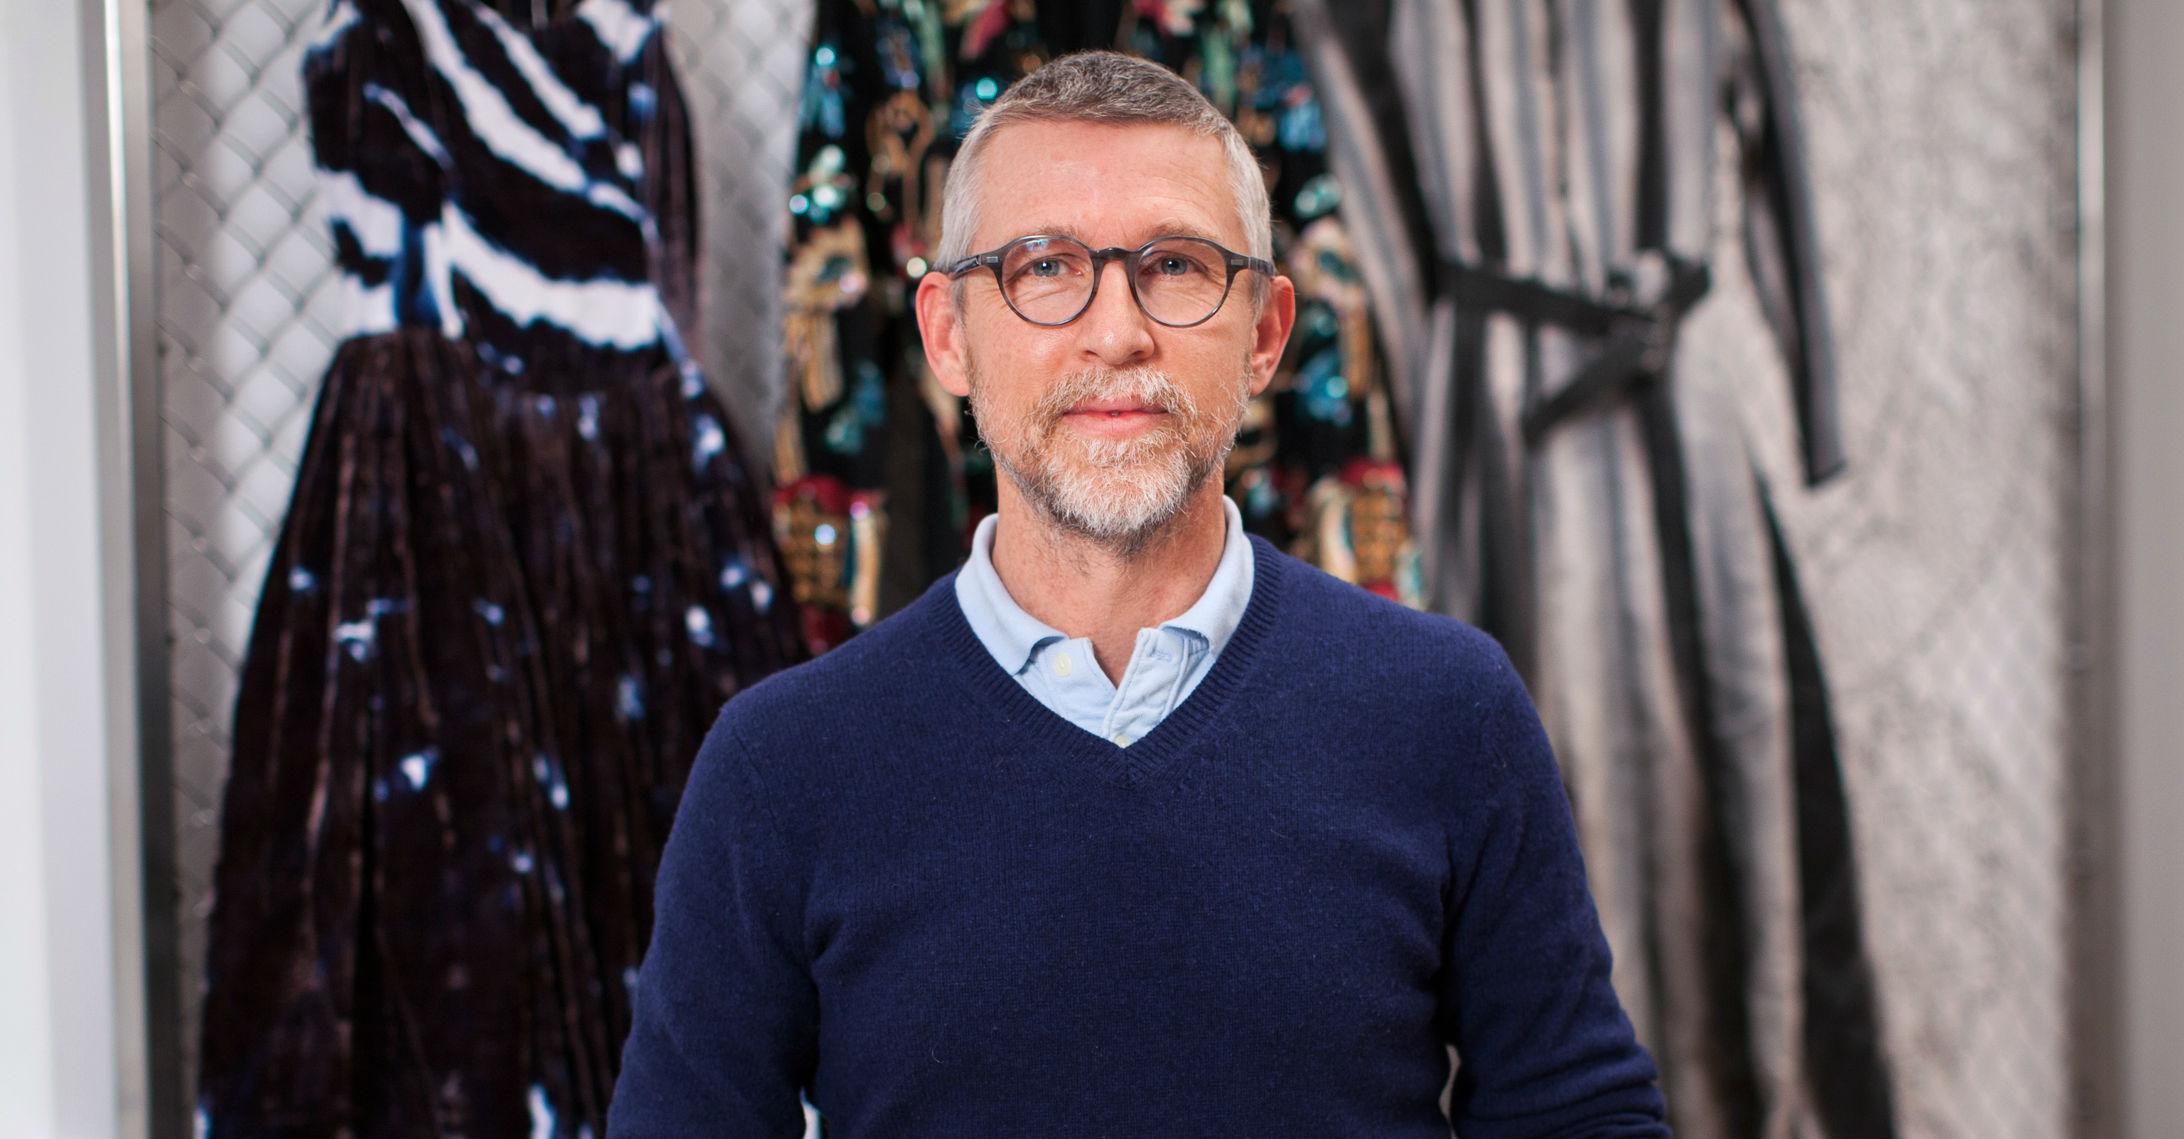 Todd Oldham fashions